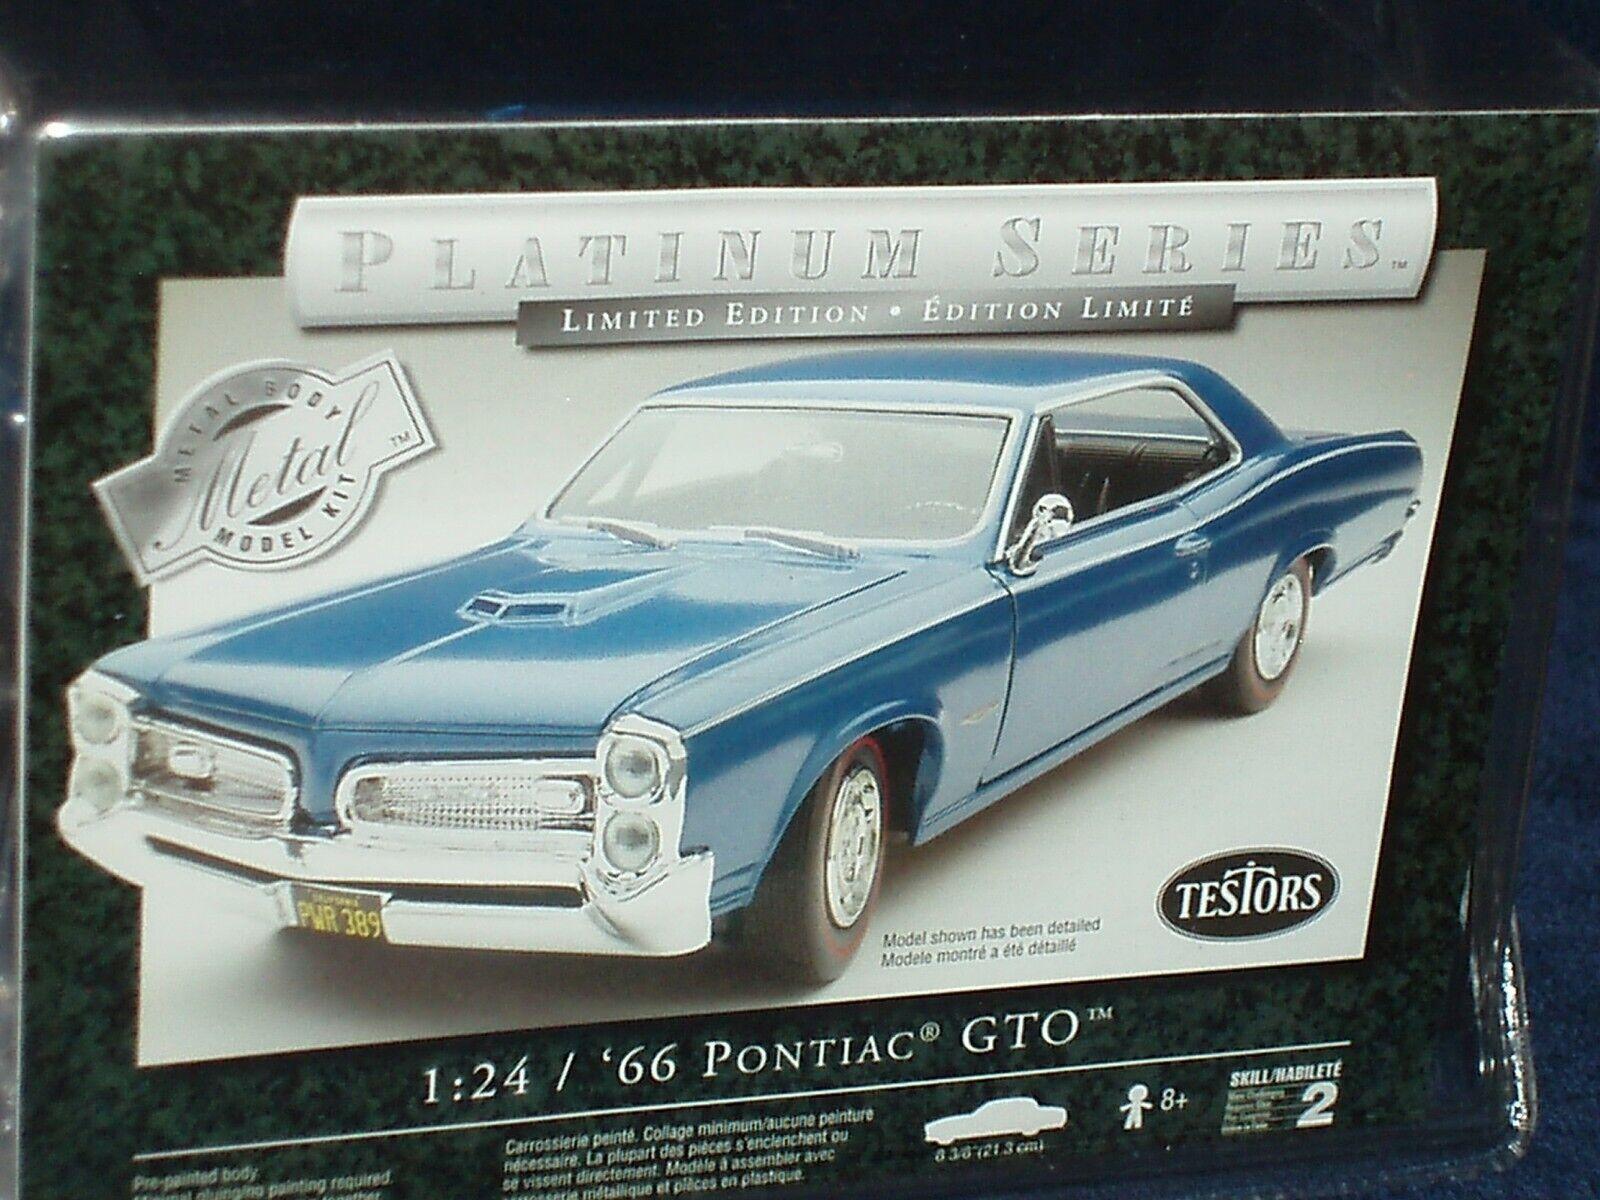 TESTORS 1966 PONTIAC GTO HARDTOP ASSEMBLY KIT 1 24 SKILL LEVEL 2 blueE